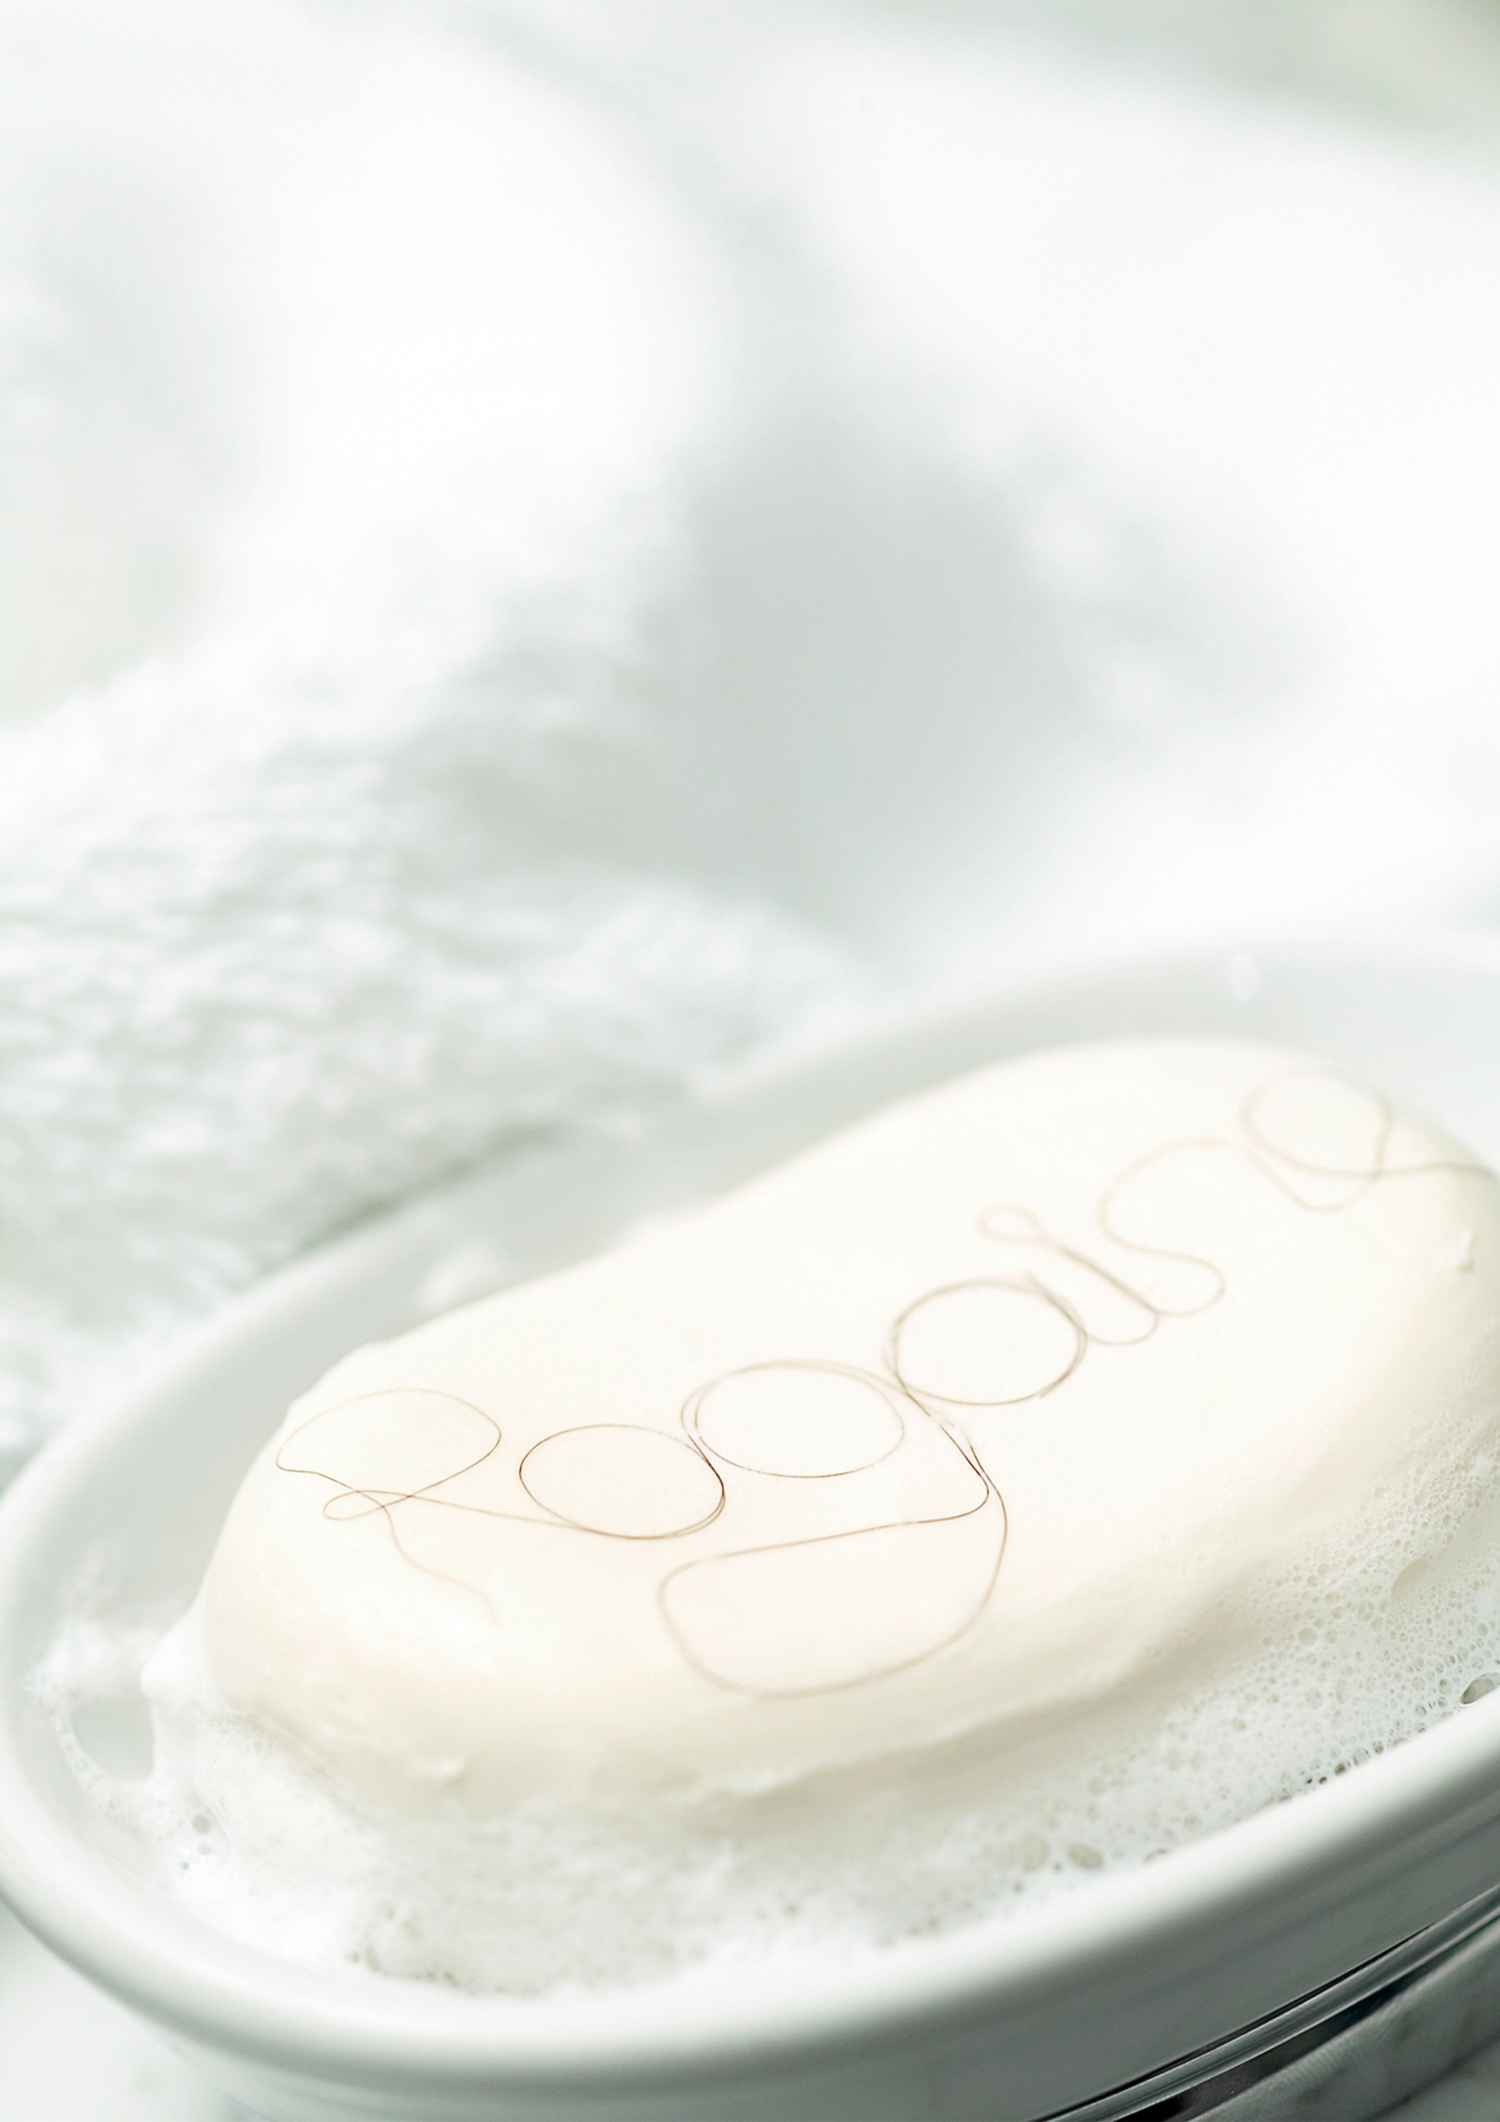 ROGAIN-SOAP-SSFV-copy.jpg